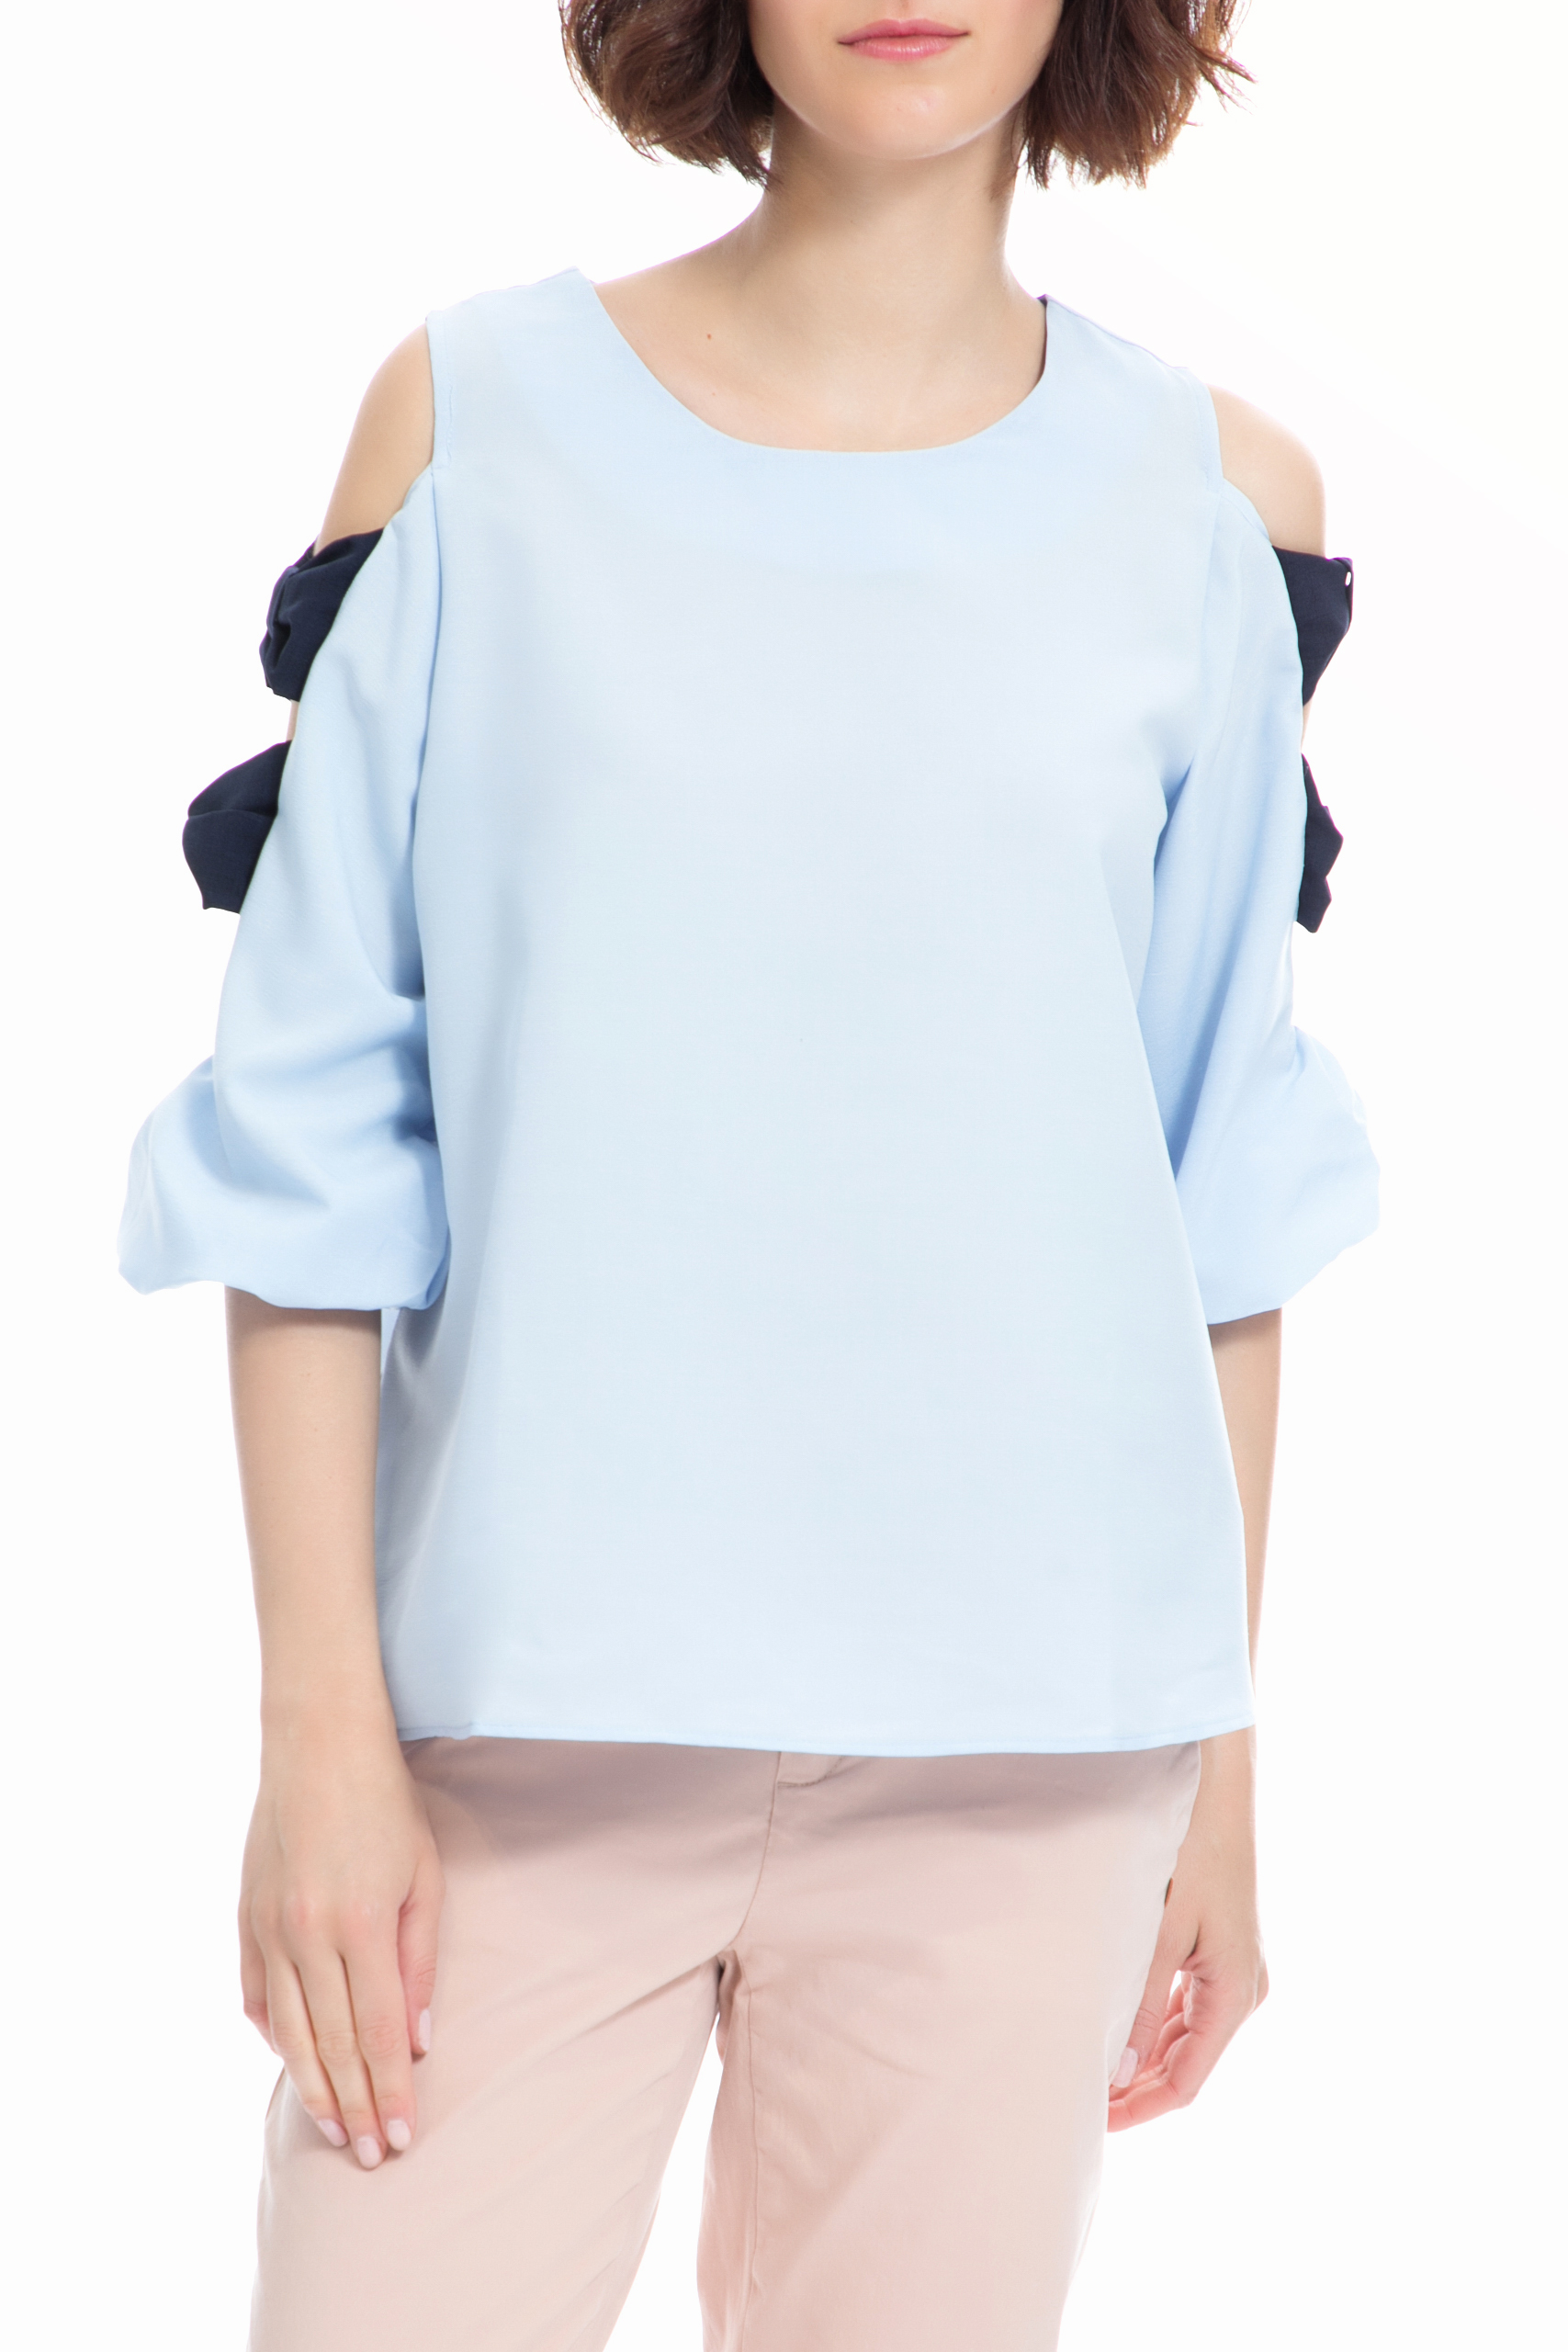 MOLLY BRACKEN - Γυναικείο τοπ MOLLY BRACKEN γαλάζιο γυναικεία ρούχα μπλούζες τοπ